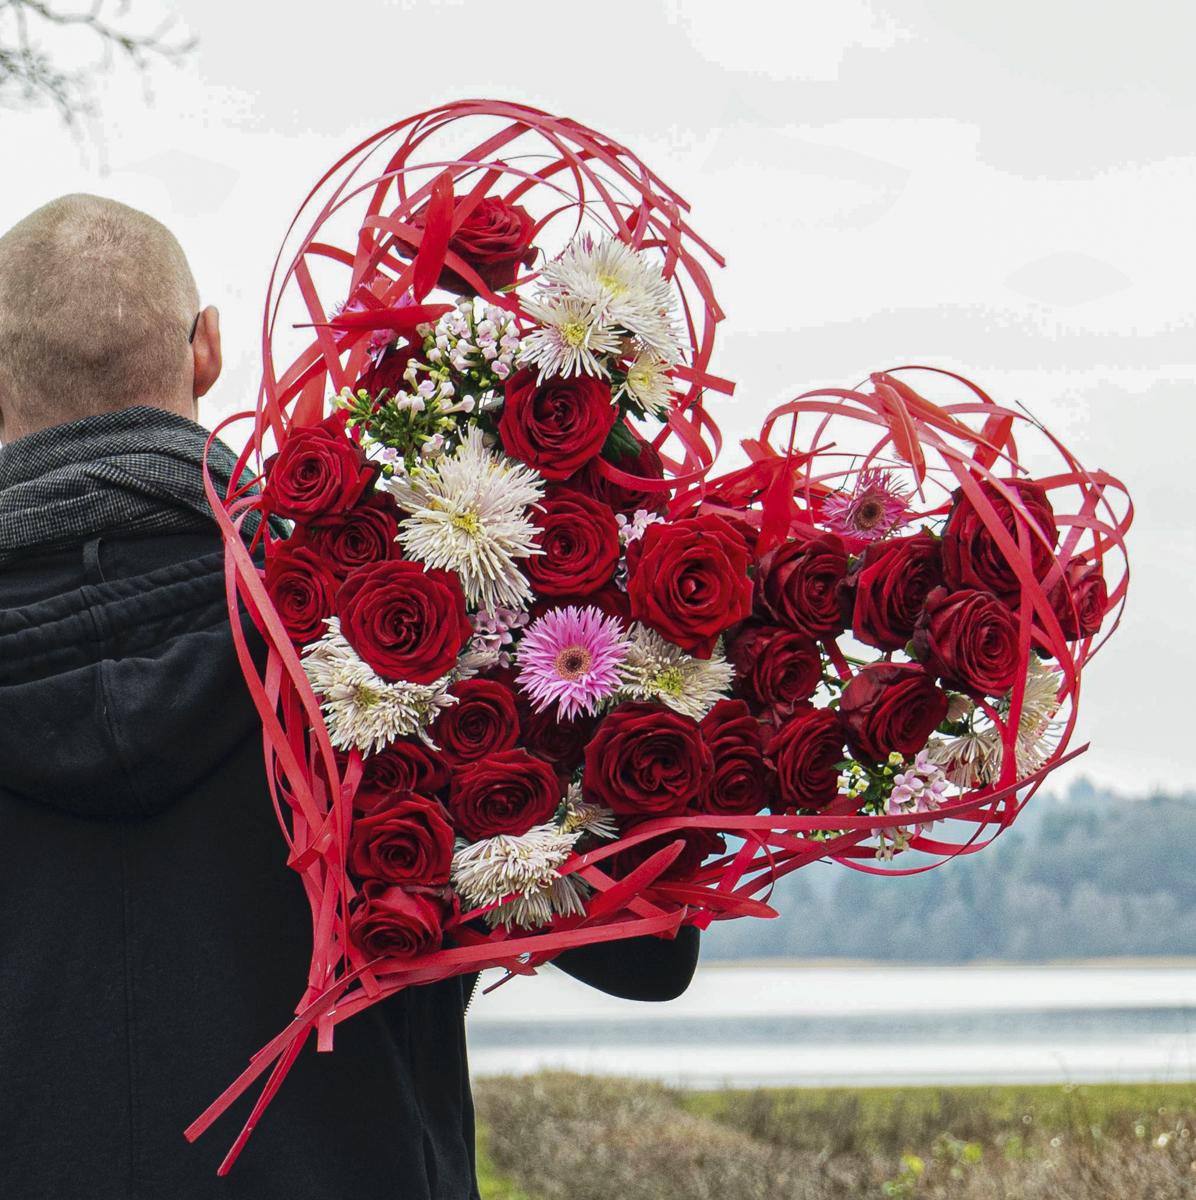 Dan Xavier captures emotion with these Porta Nova arrangements